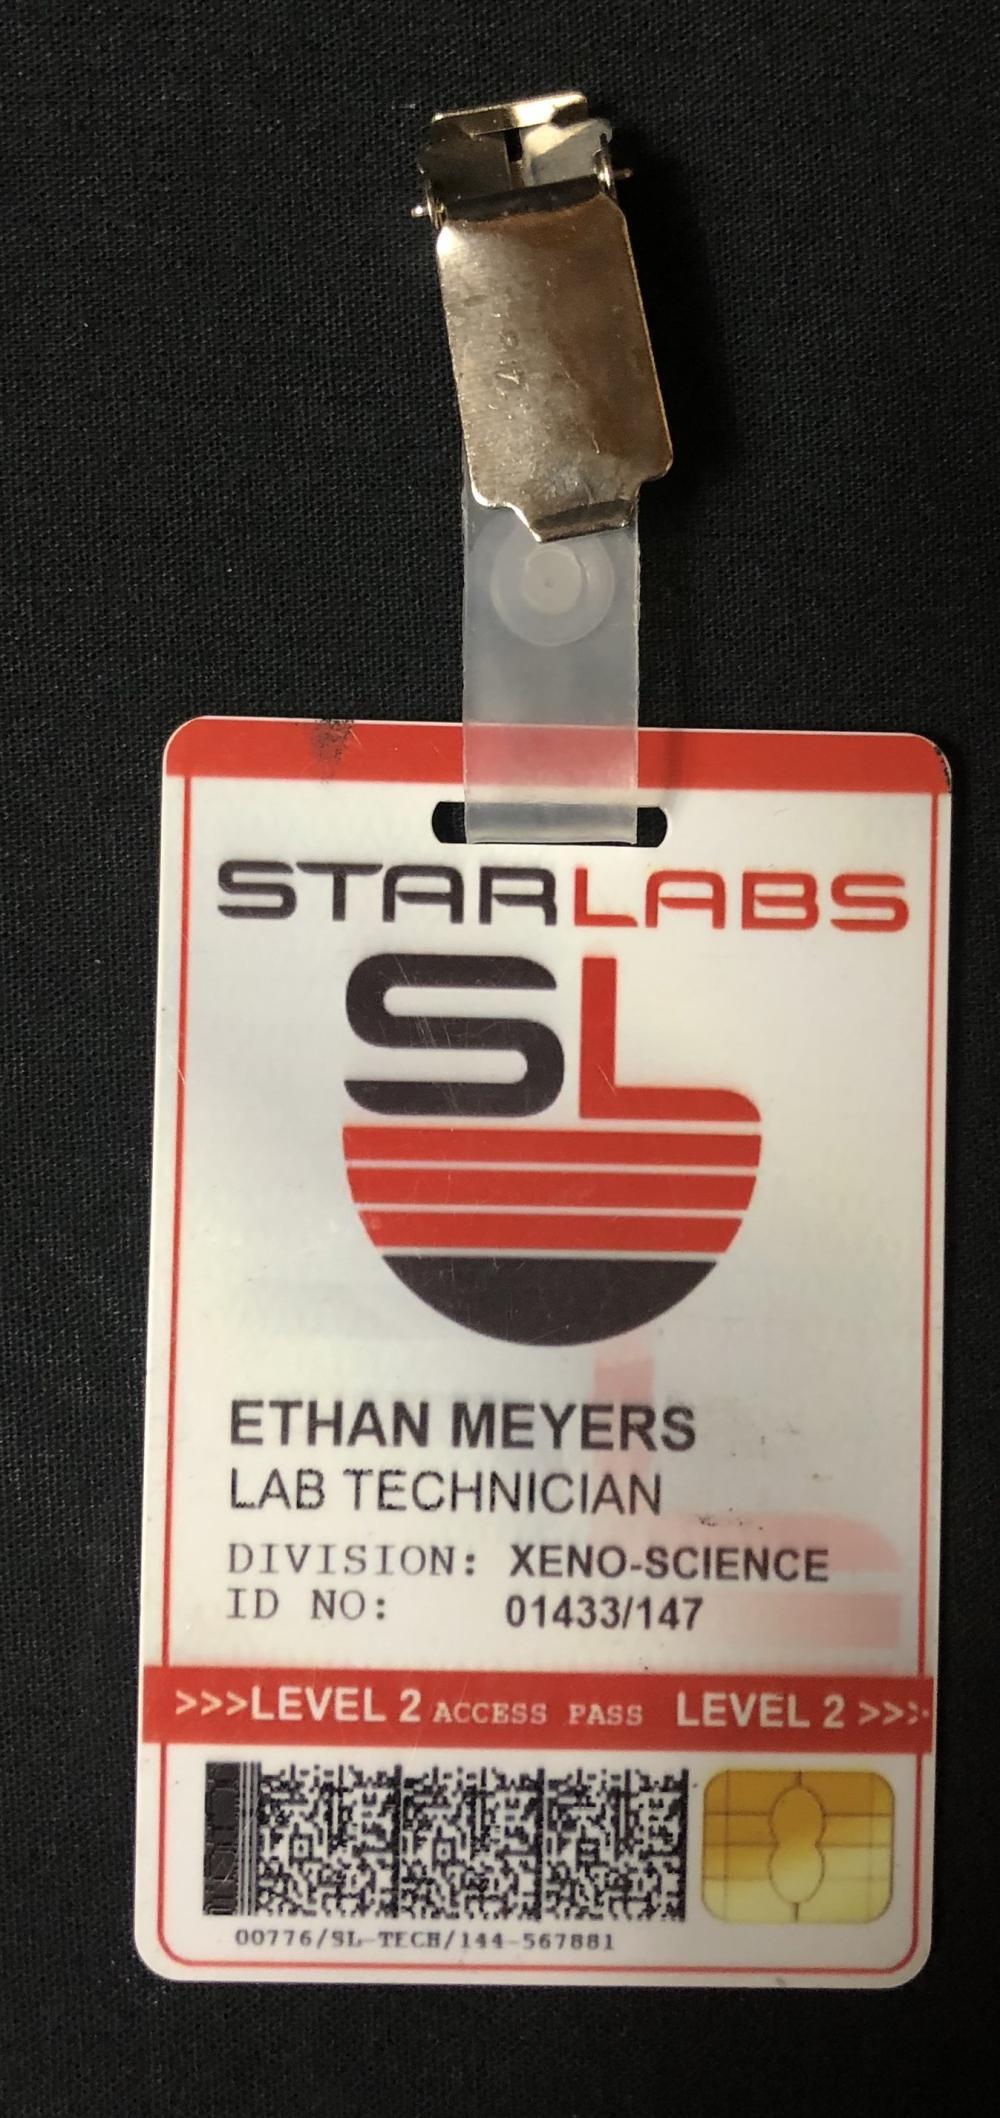 Lot 148: Batman v Superman: Dawn of Justice (2016) - Starlabs Lab Technician Badge